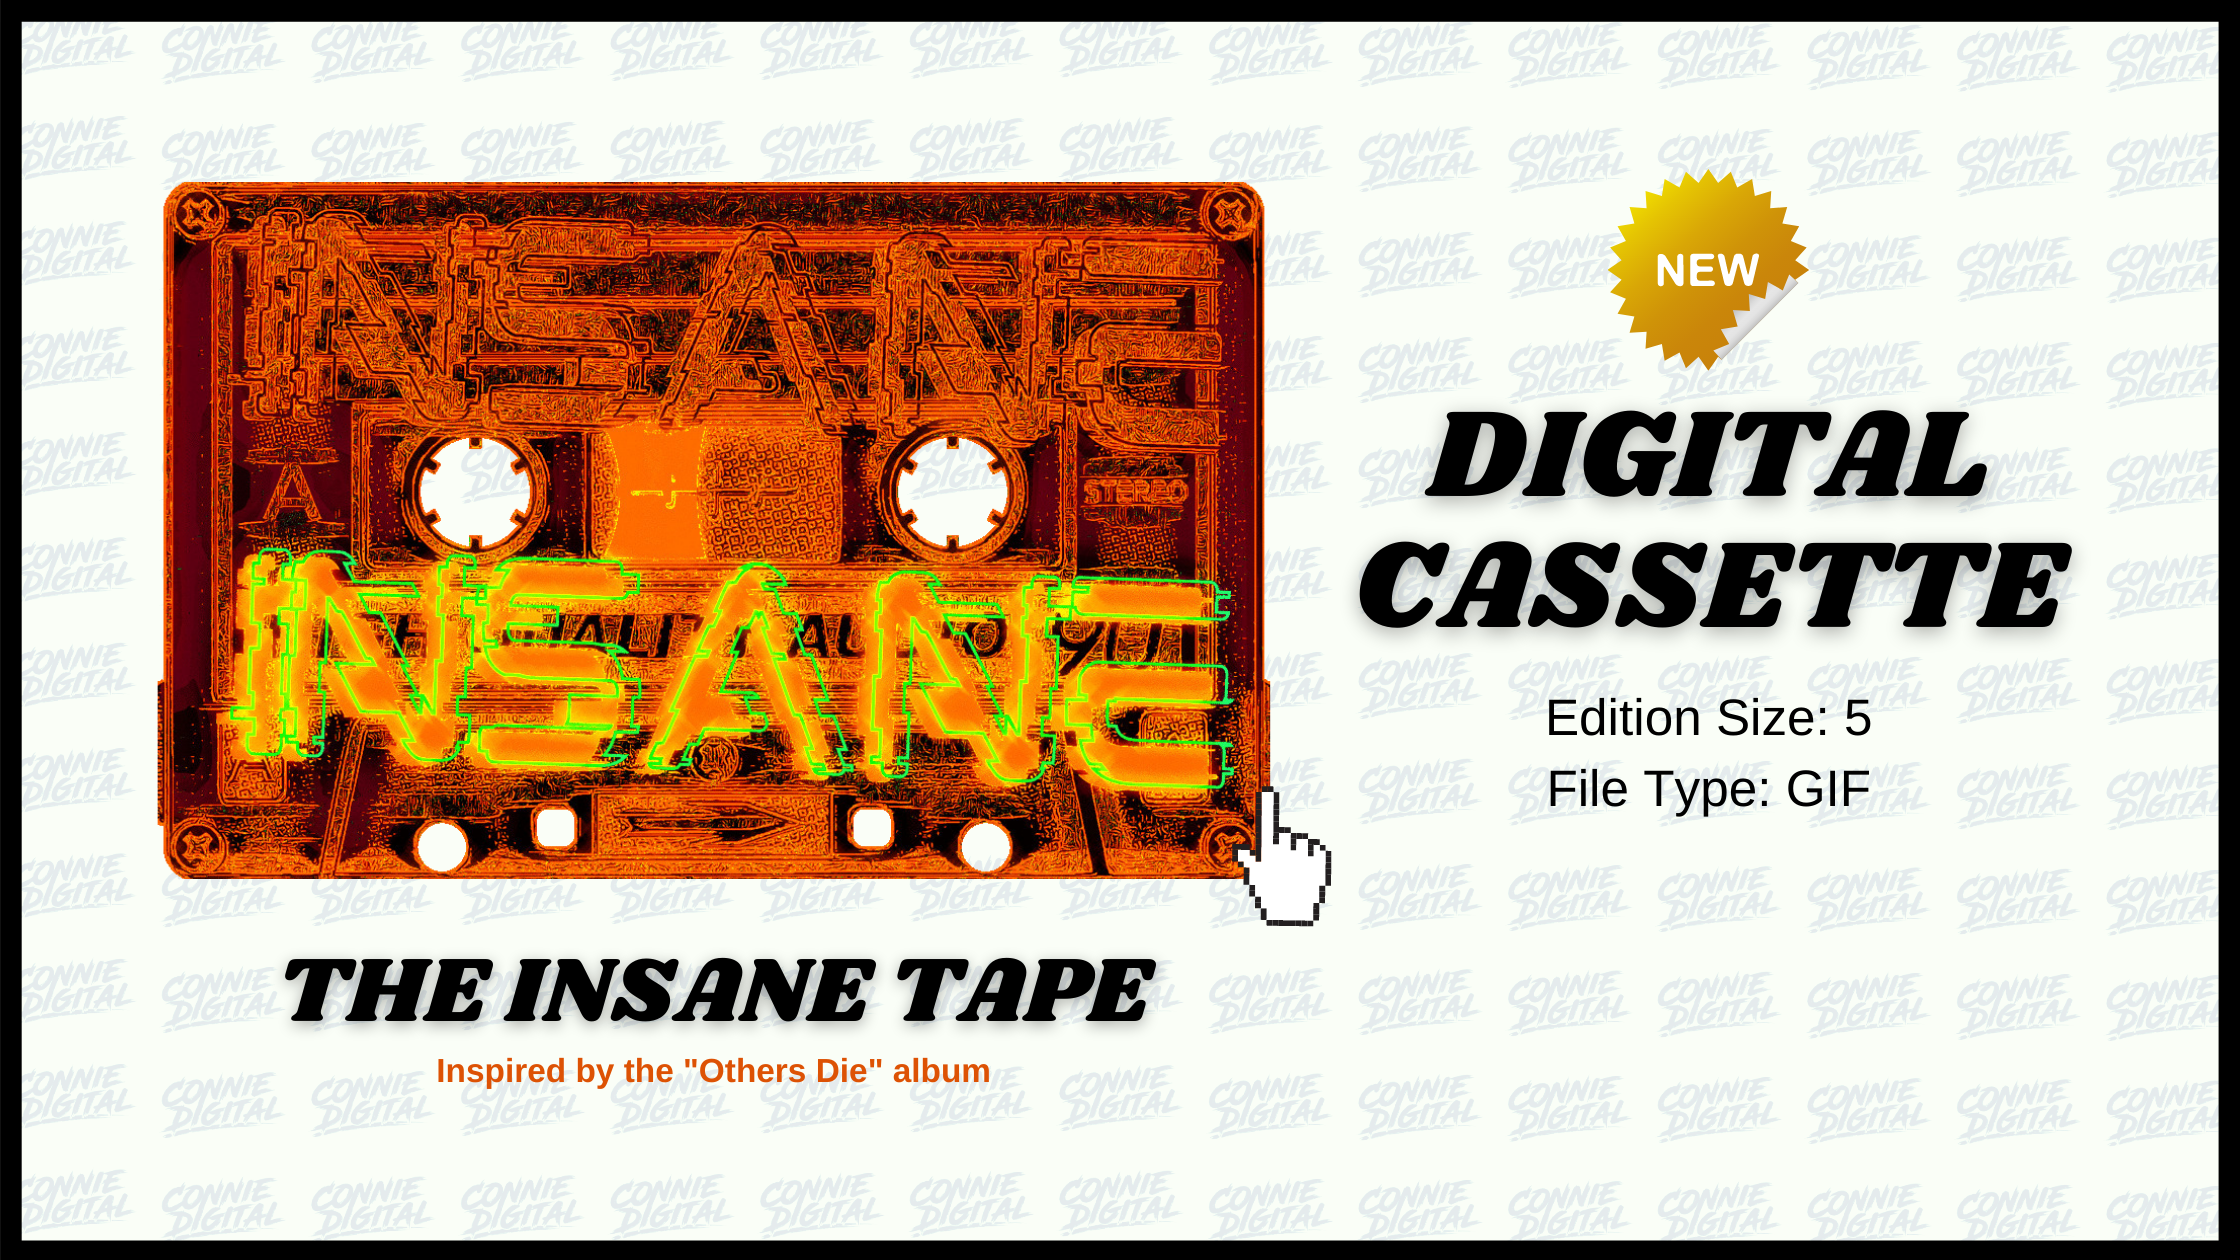 Insane Tape Connie Digital Mighty33 Others Die Blockchain album NFT Music